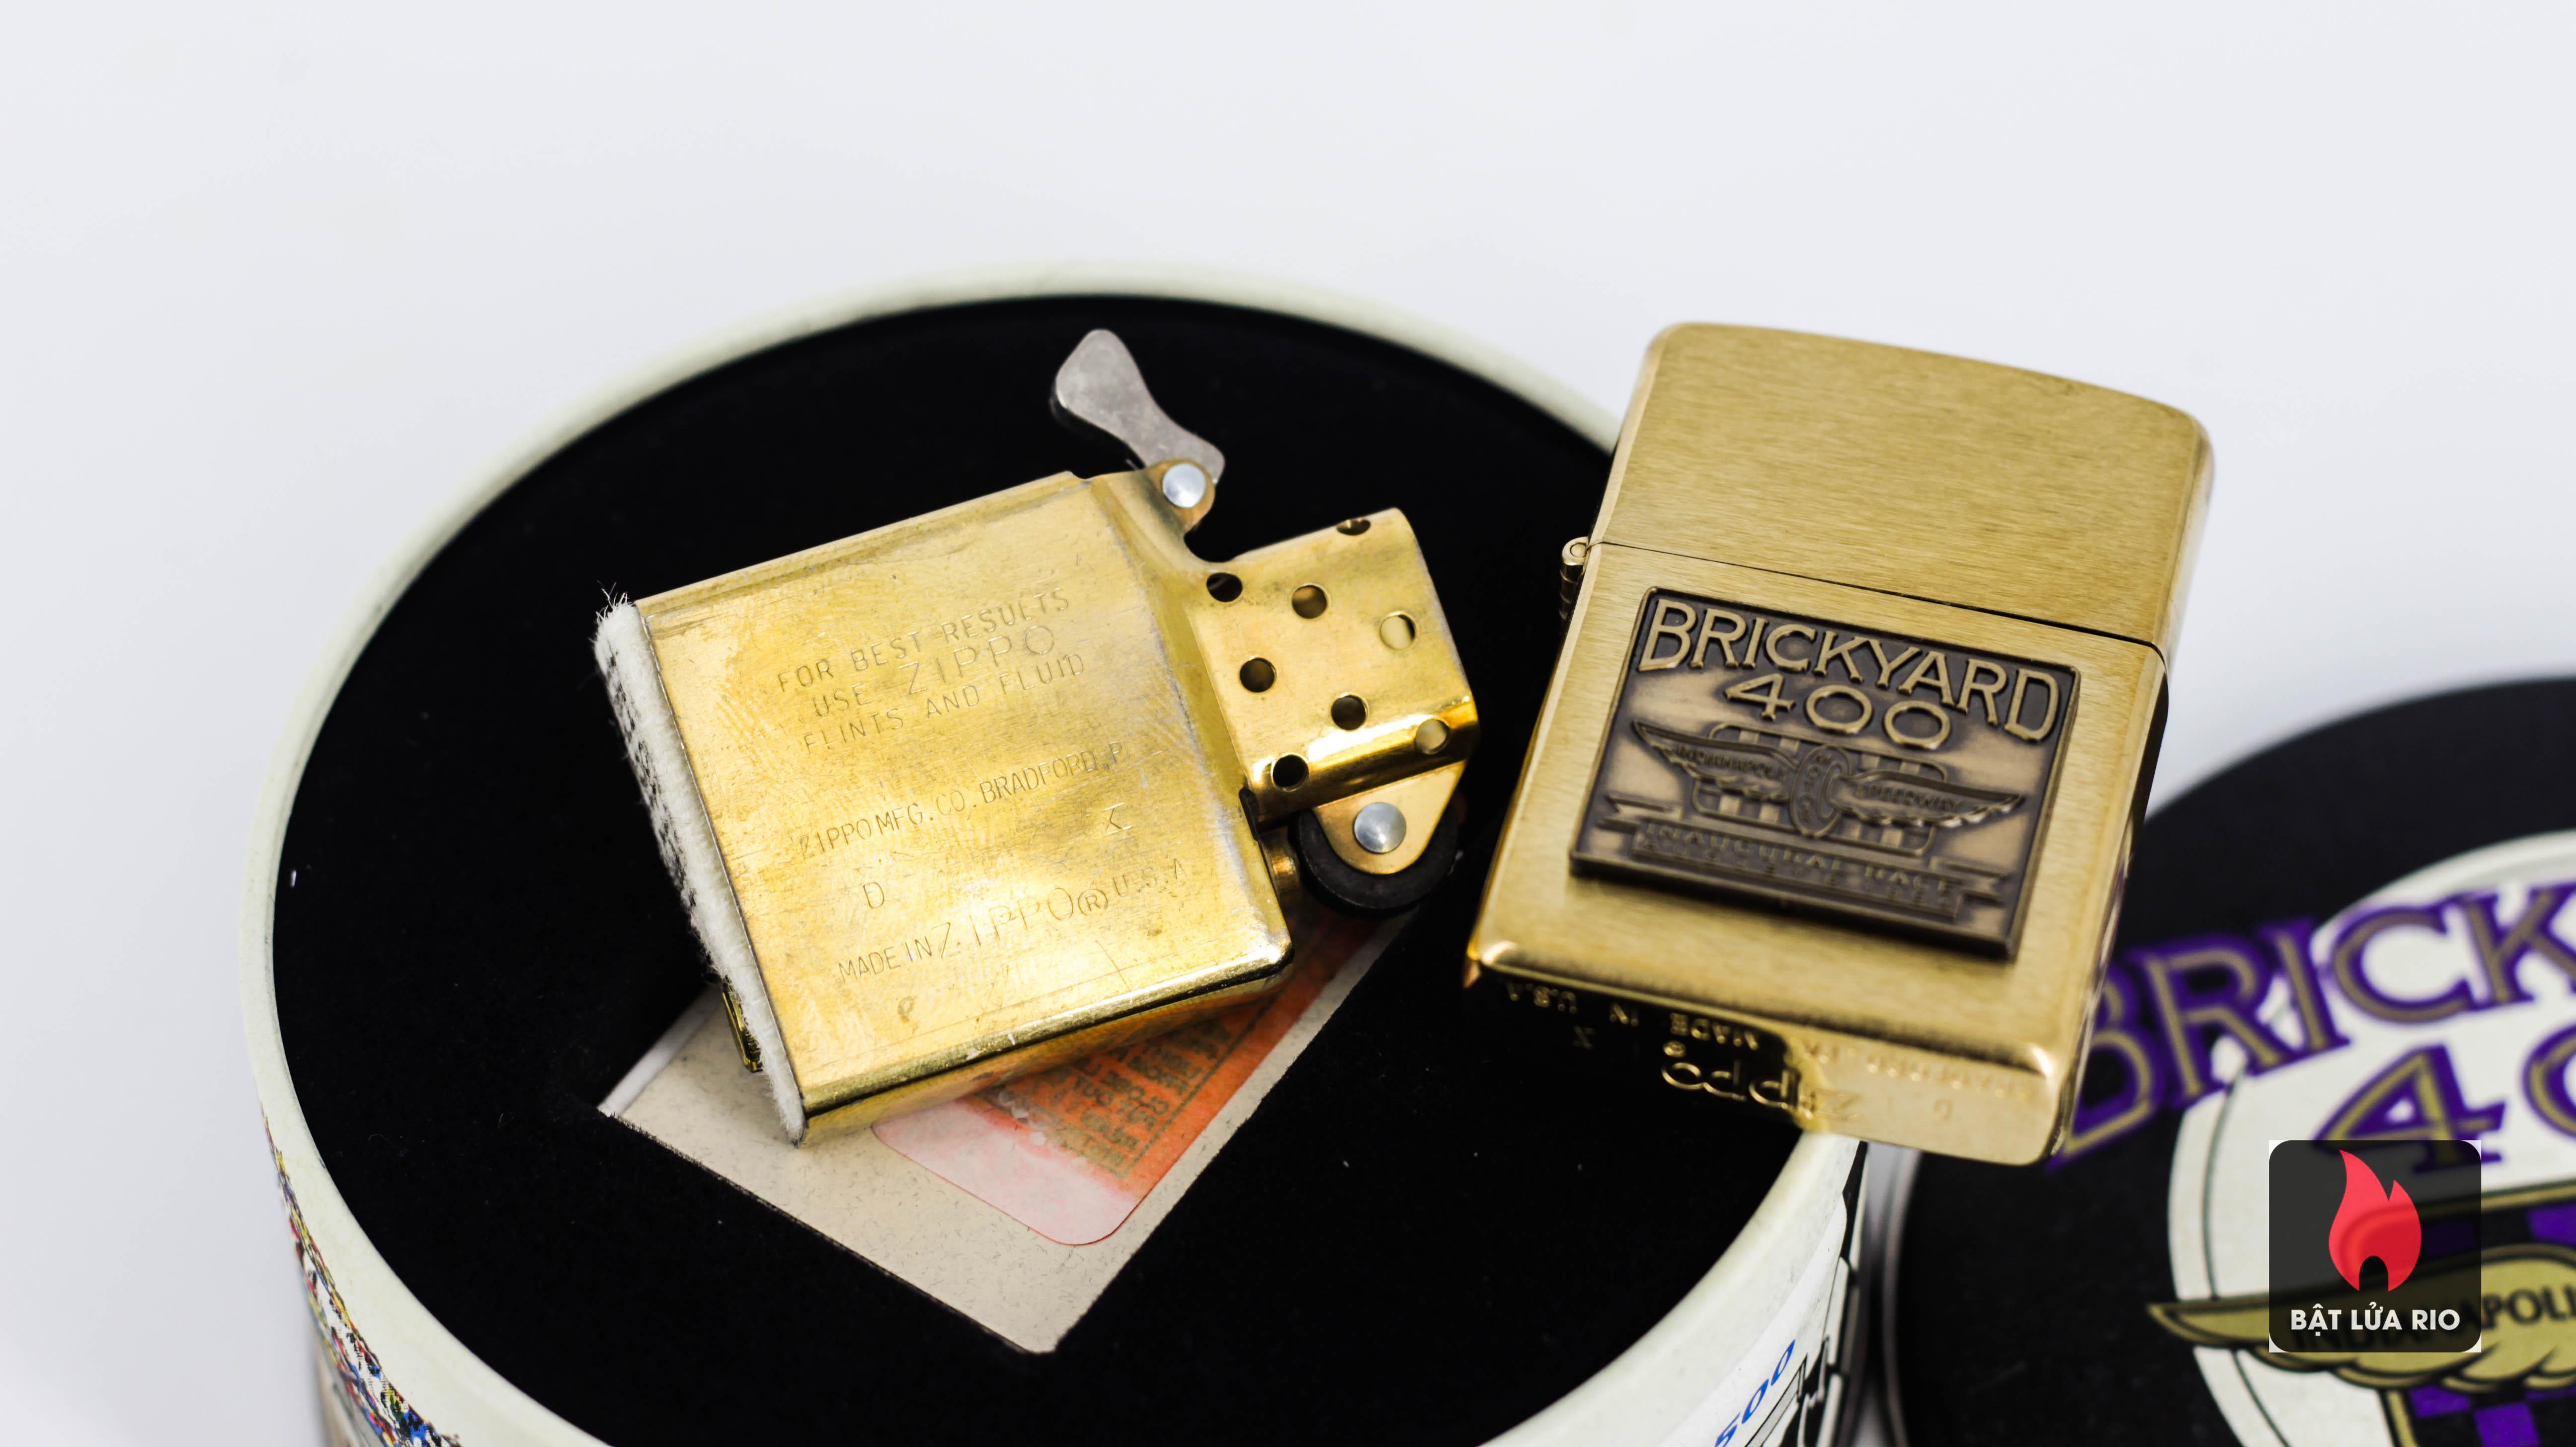 Zippo La Mã 1994 - Brickyard 400 - Brushed Brass 4